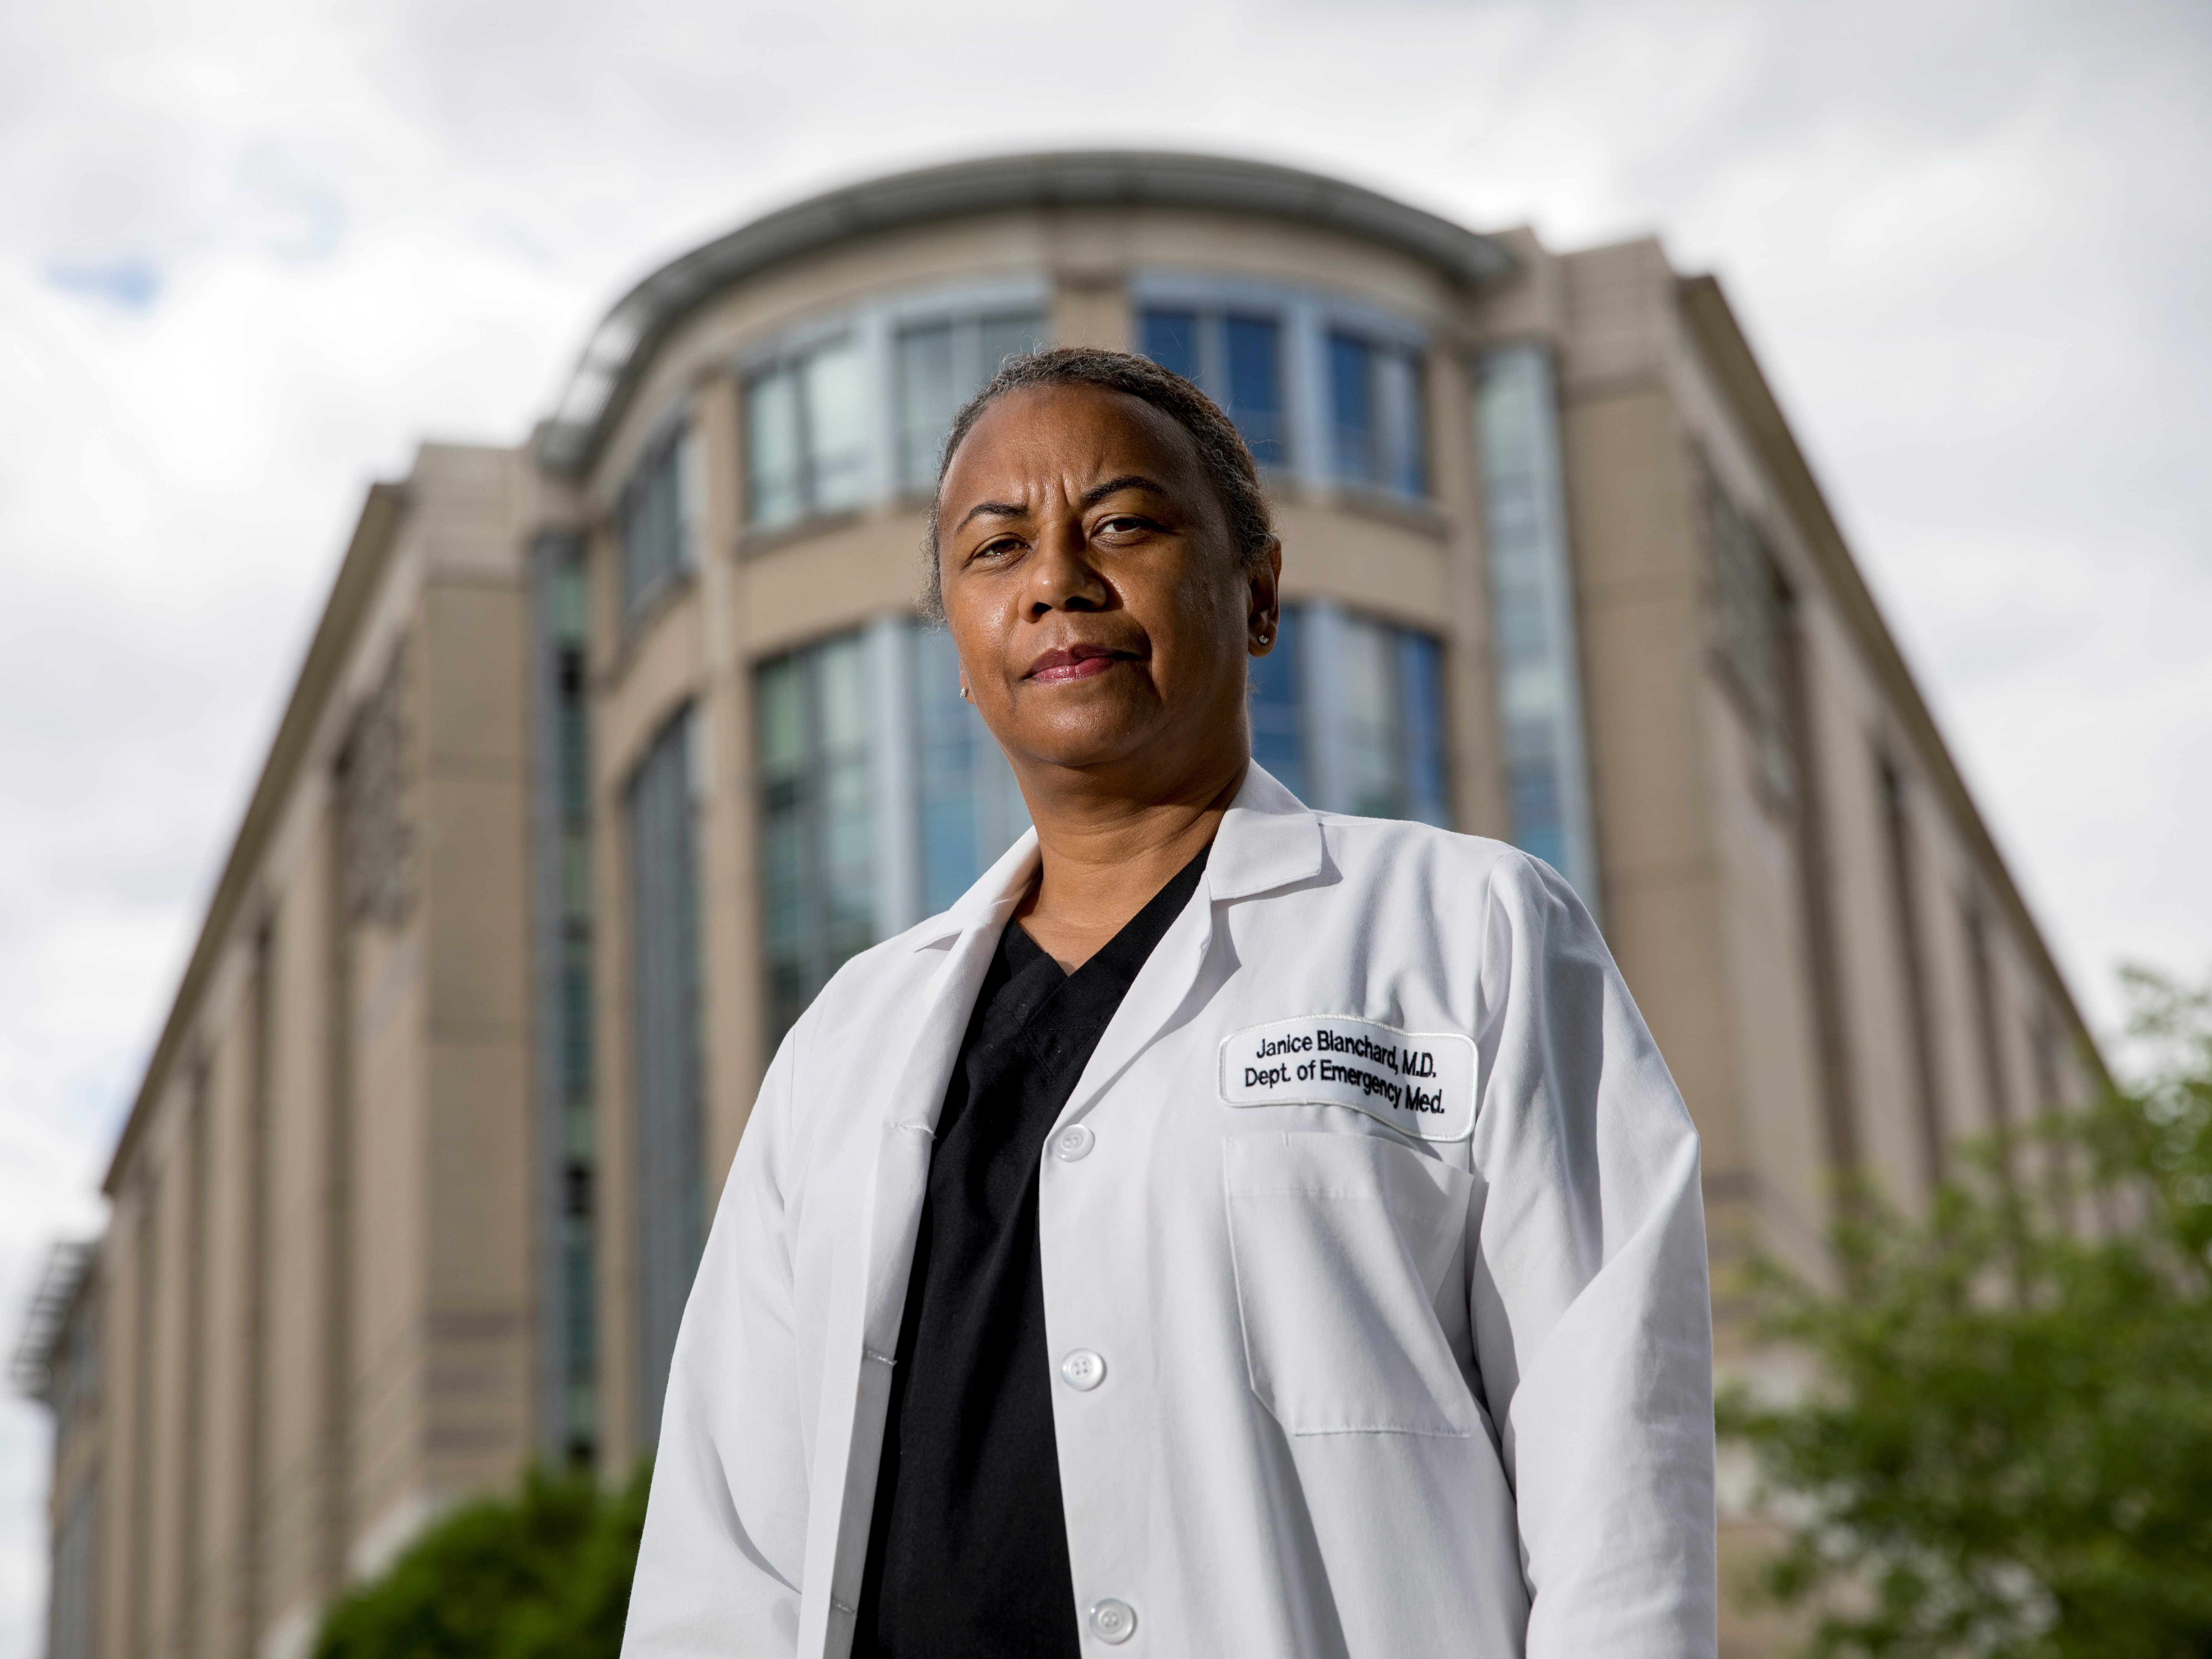 Dr. Janice Blanchard